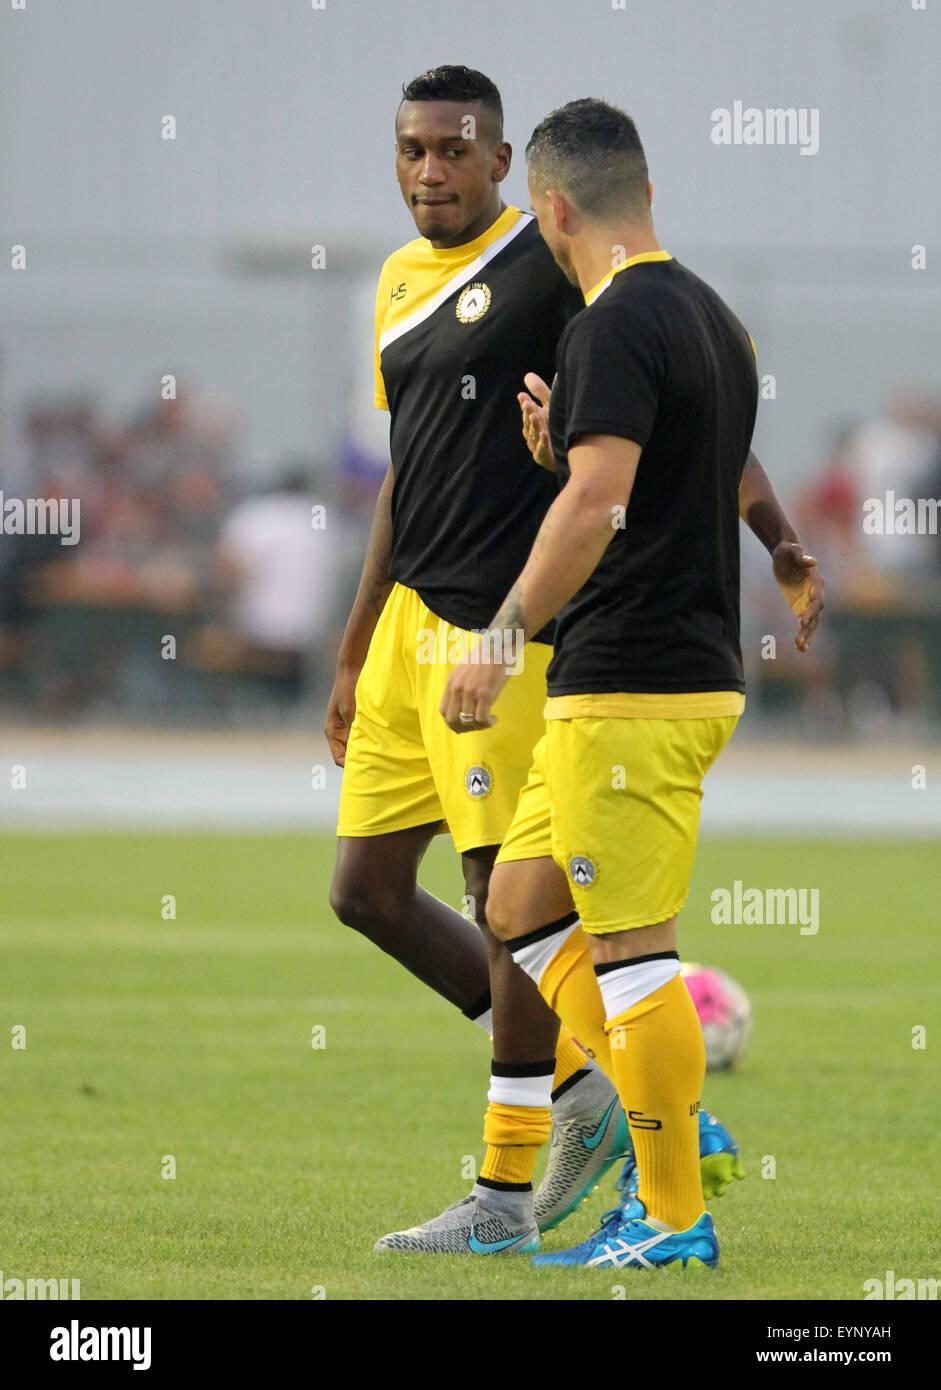 ITALY, Lignano: during the friendly pre-season football match Udinese Calcio v SC Bastia on 1st August, 2015 at Stock Photo